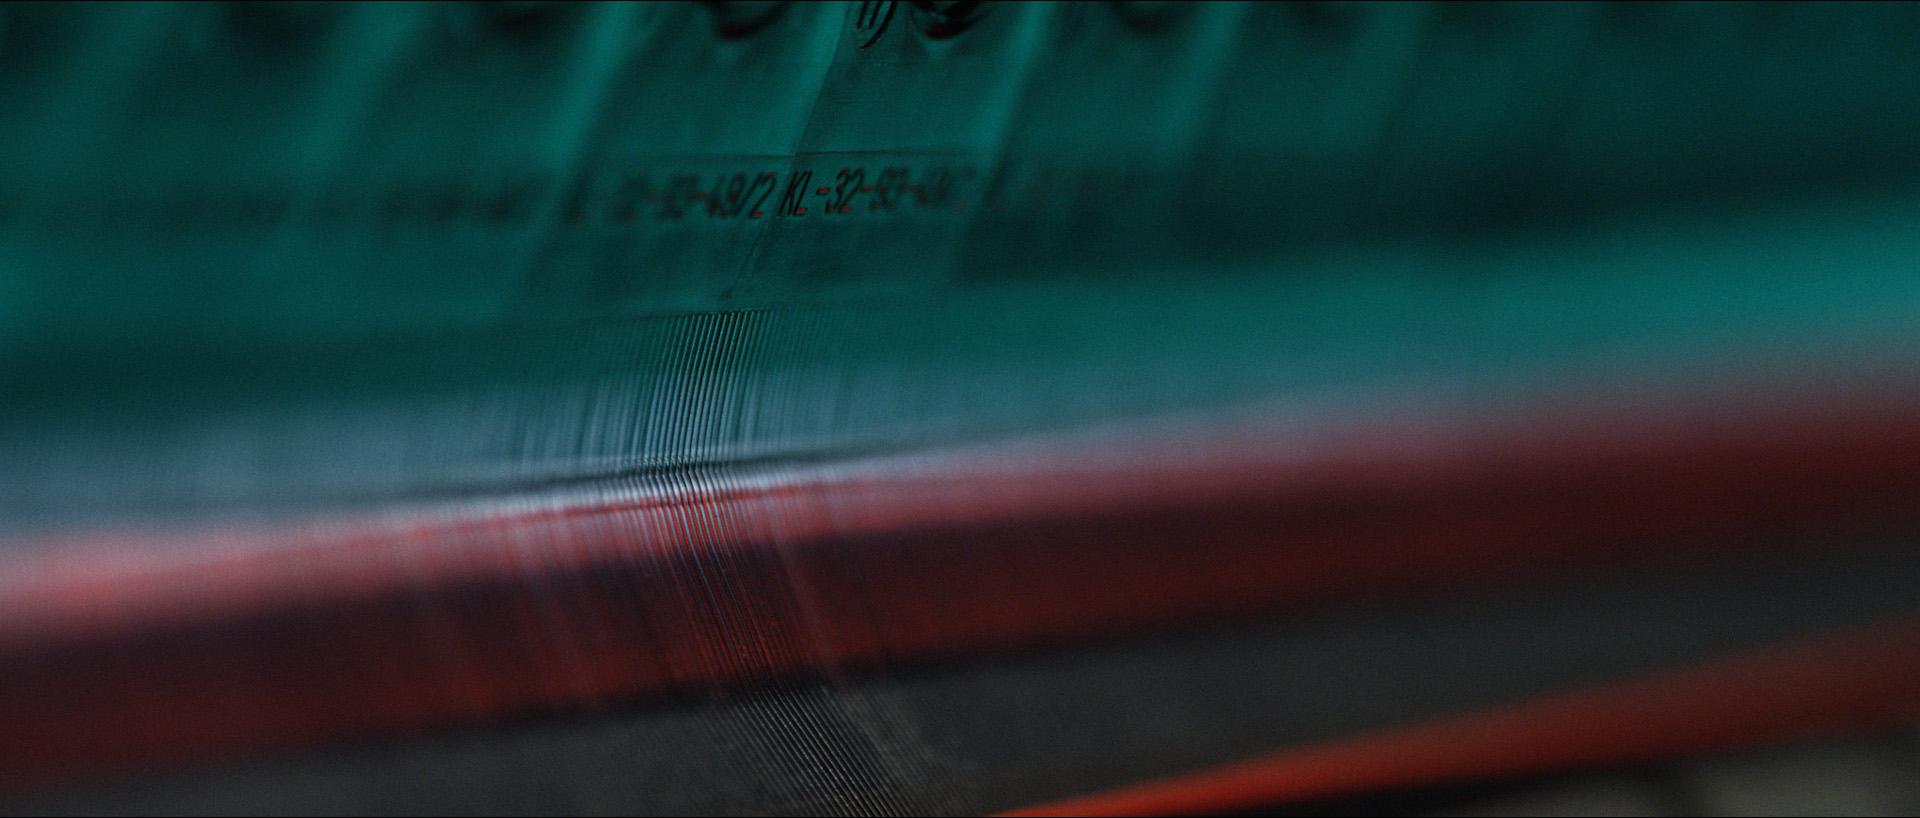 Karl-Mayer-Texture-Machine-Production-Textile_02.jpg